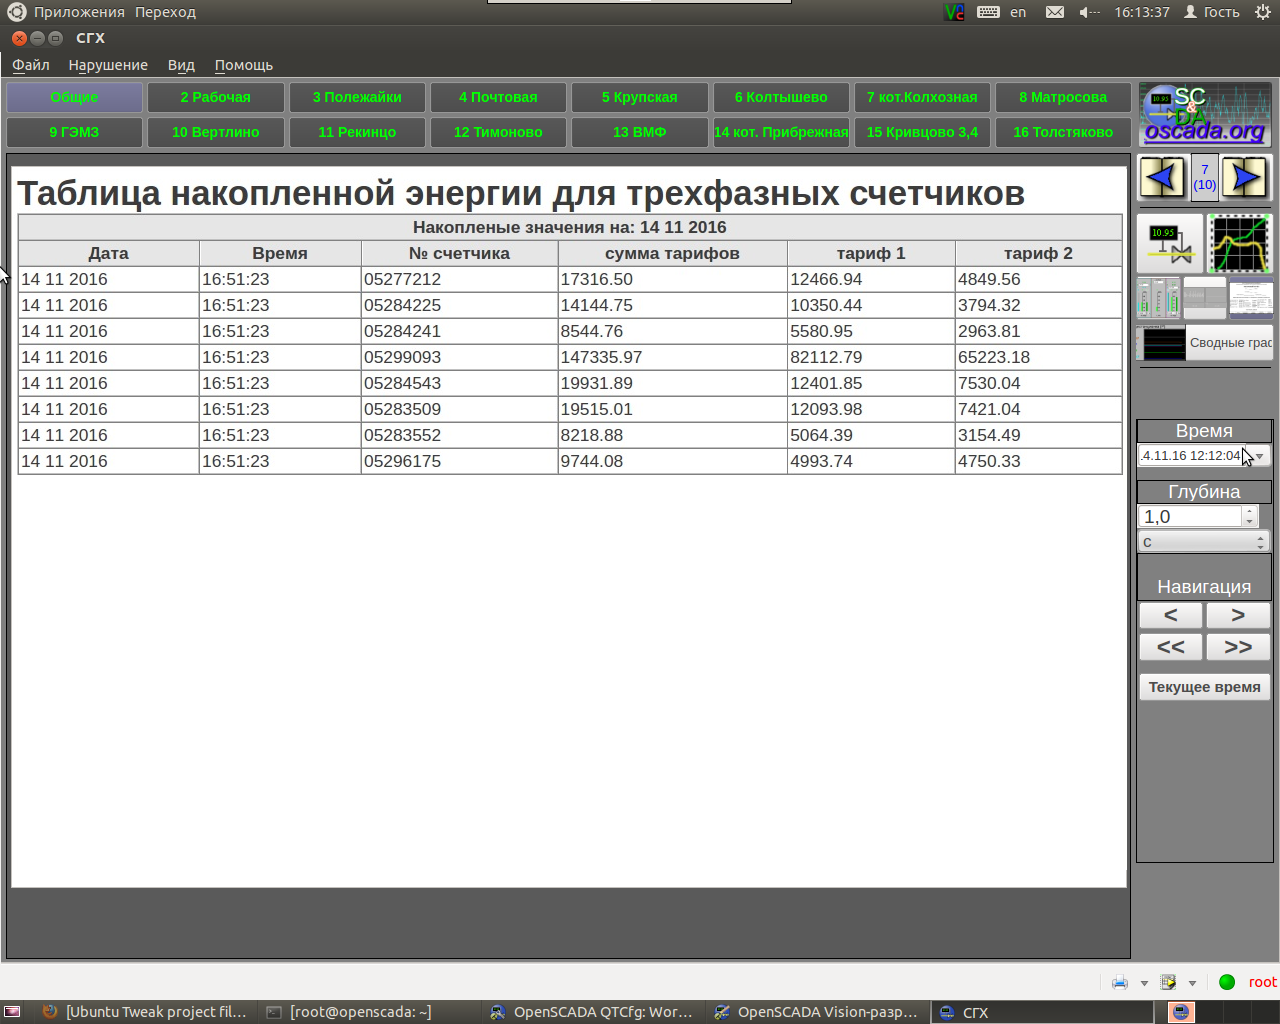 Пишем протоколы счетчиков Меркурий 230 и Меркурий 200 для OpenSCADA - 21